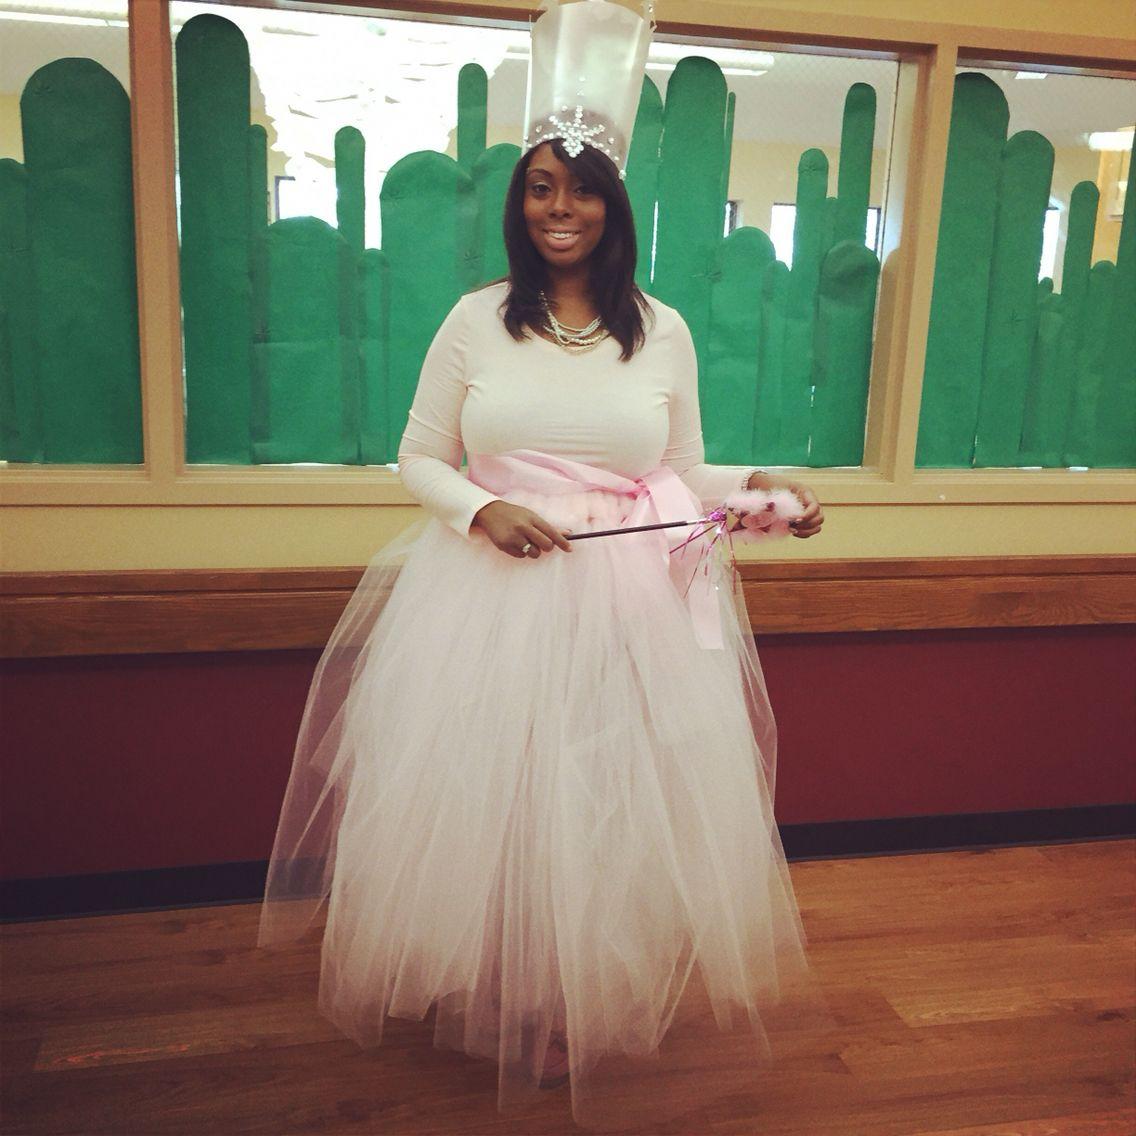 Glenda the Good Witch Halloween Costume | Fashionista ...